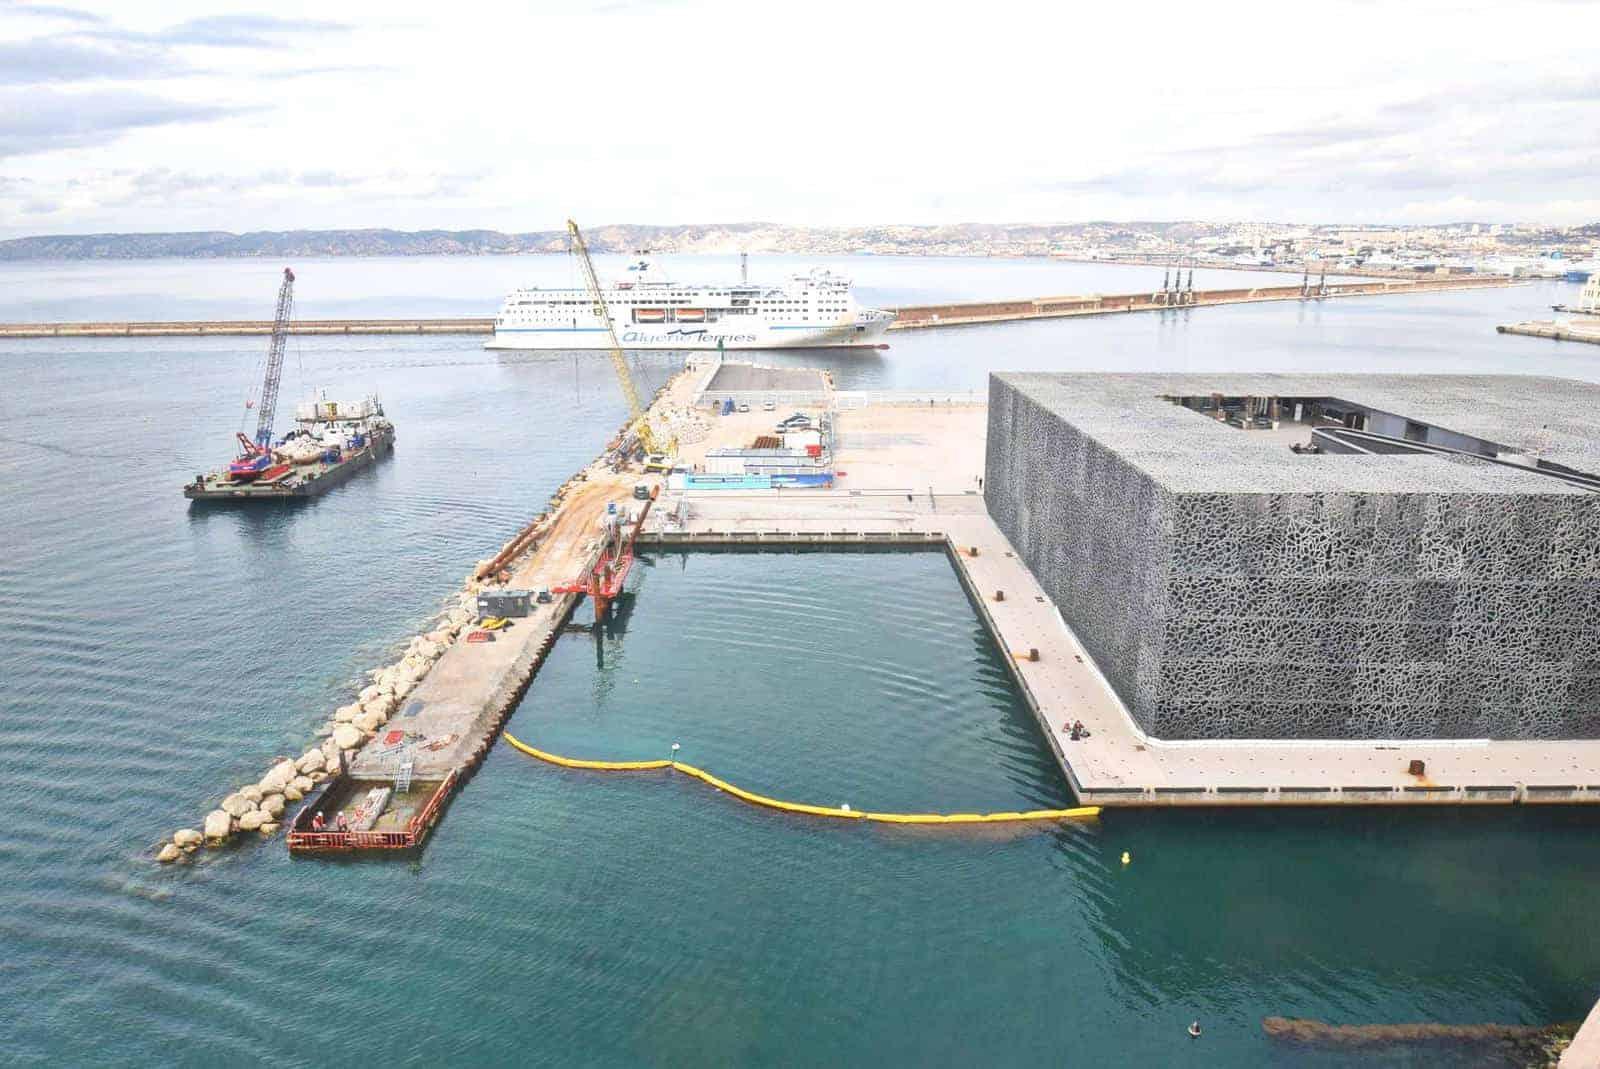 chantier-digue-j4-mucem-quai-embarcation